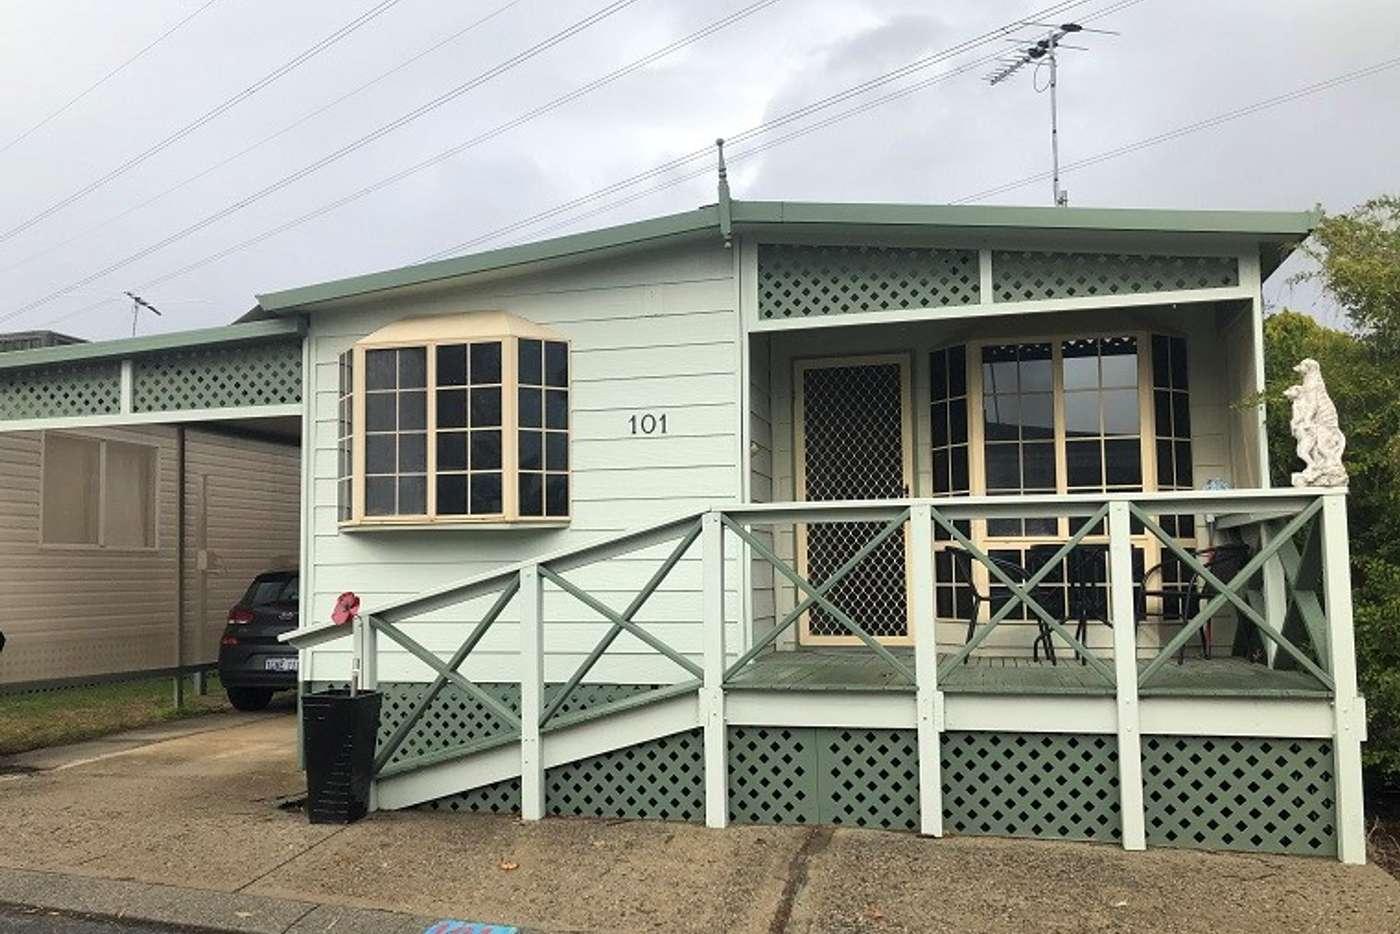 Main view of Homely house listing, 101/91 Benara Road, Caversham WA 6055